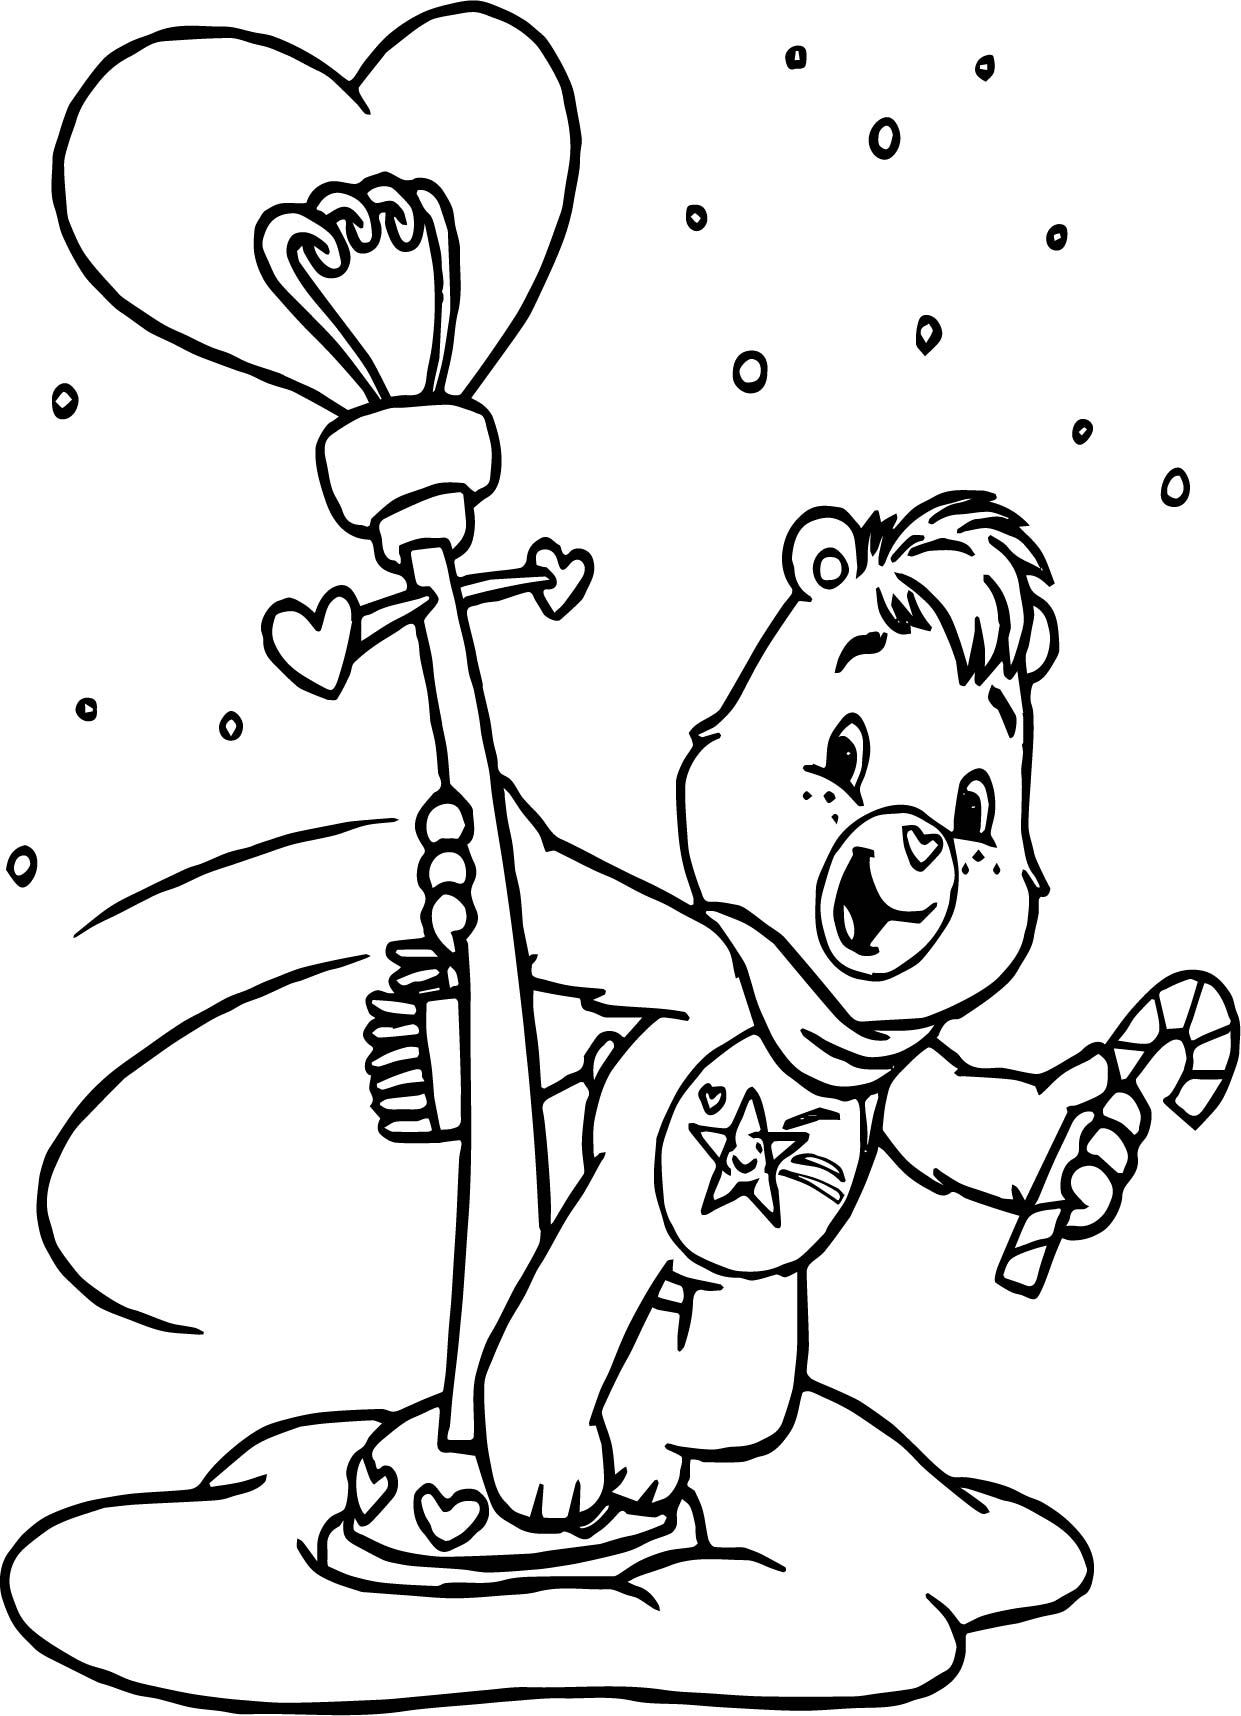 Care Bear Street Lamb Coloring Page